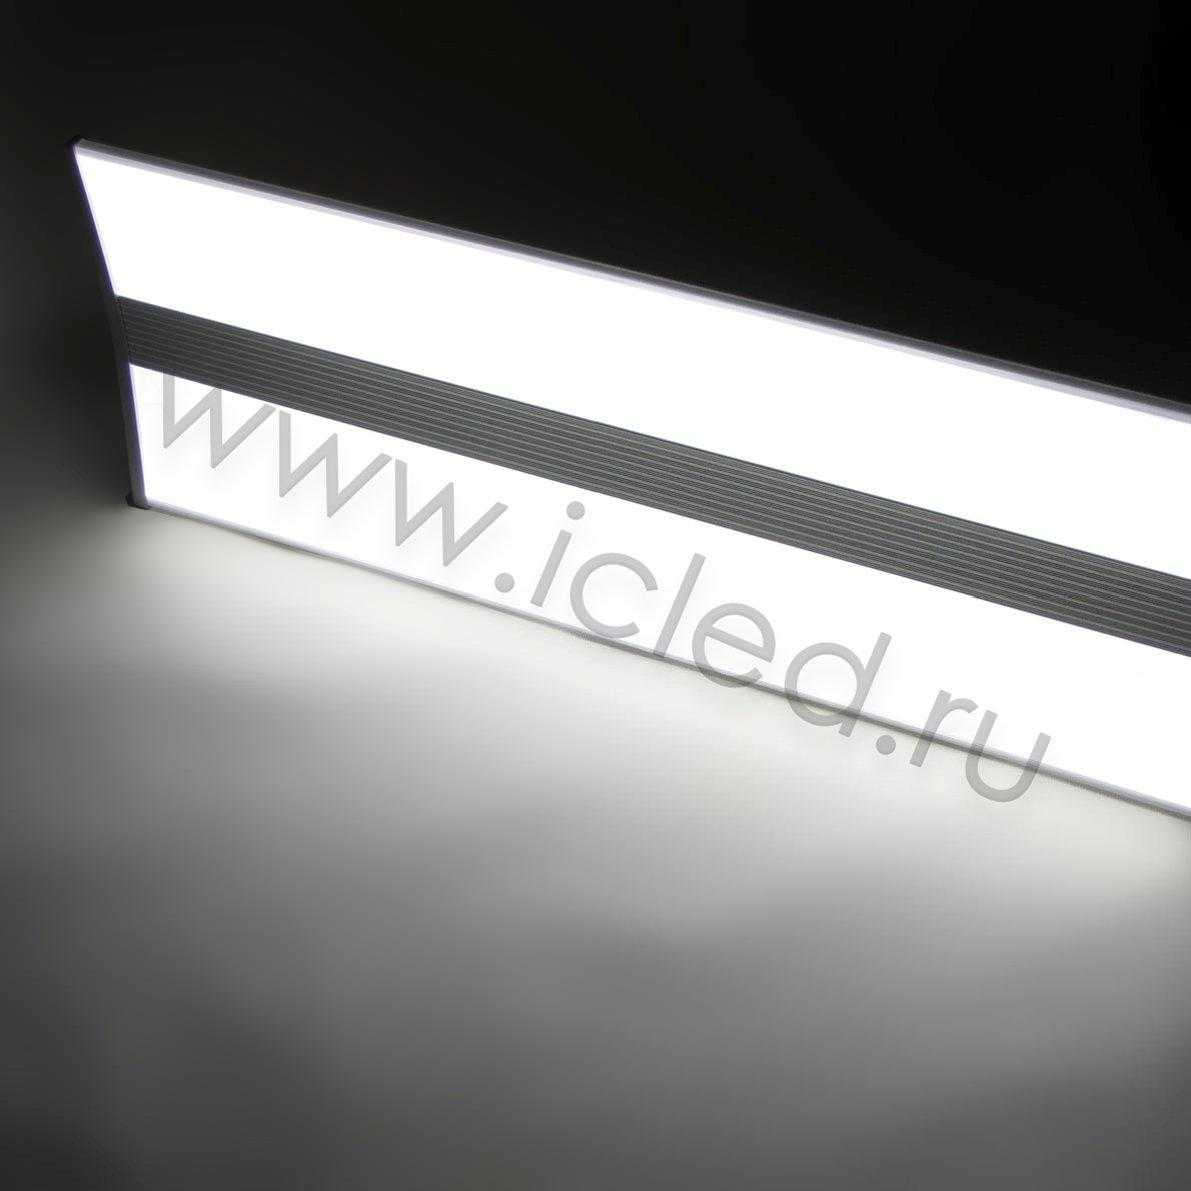 Светодиодный светильник Angle wings LIGHT-CUBE (43W, Day White)